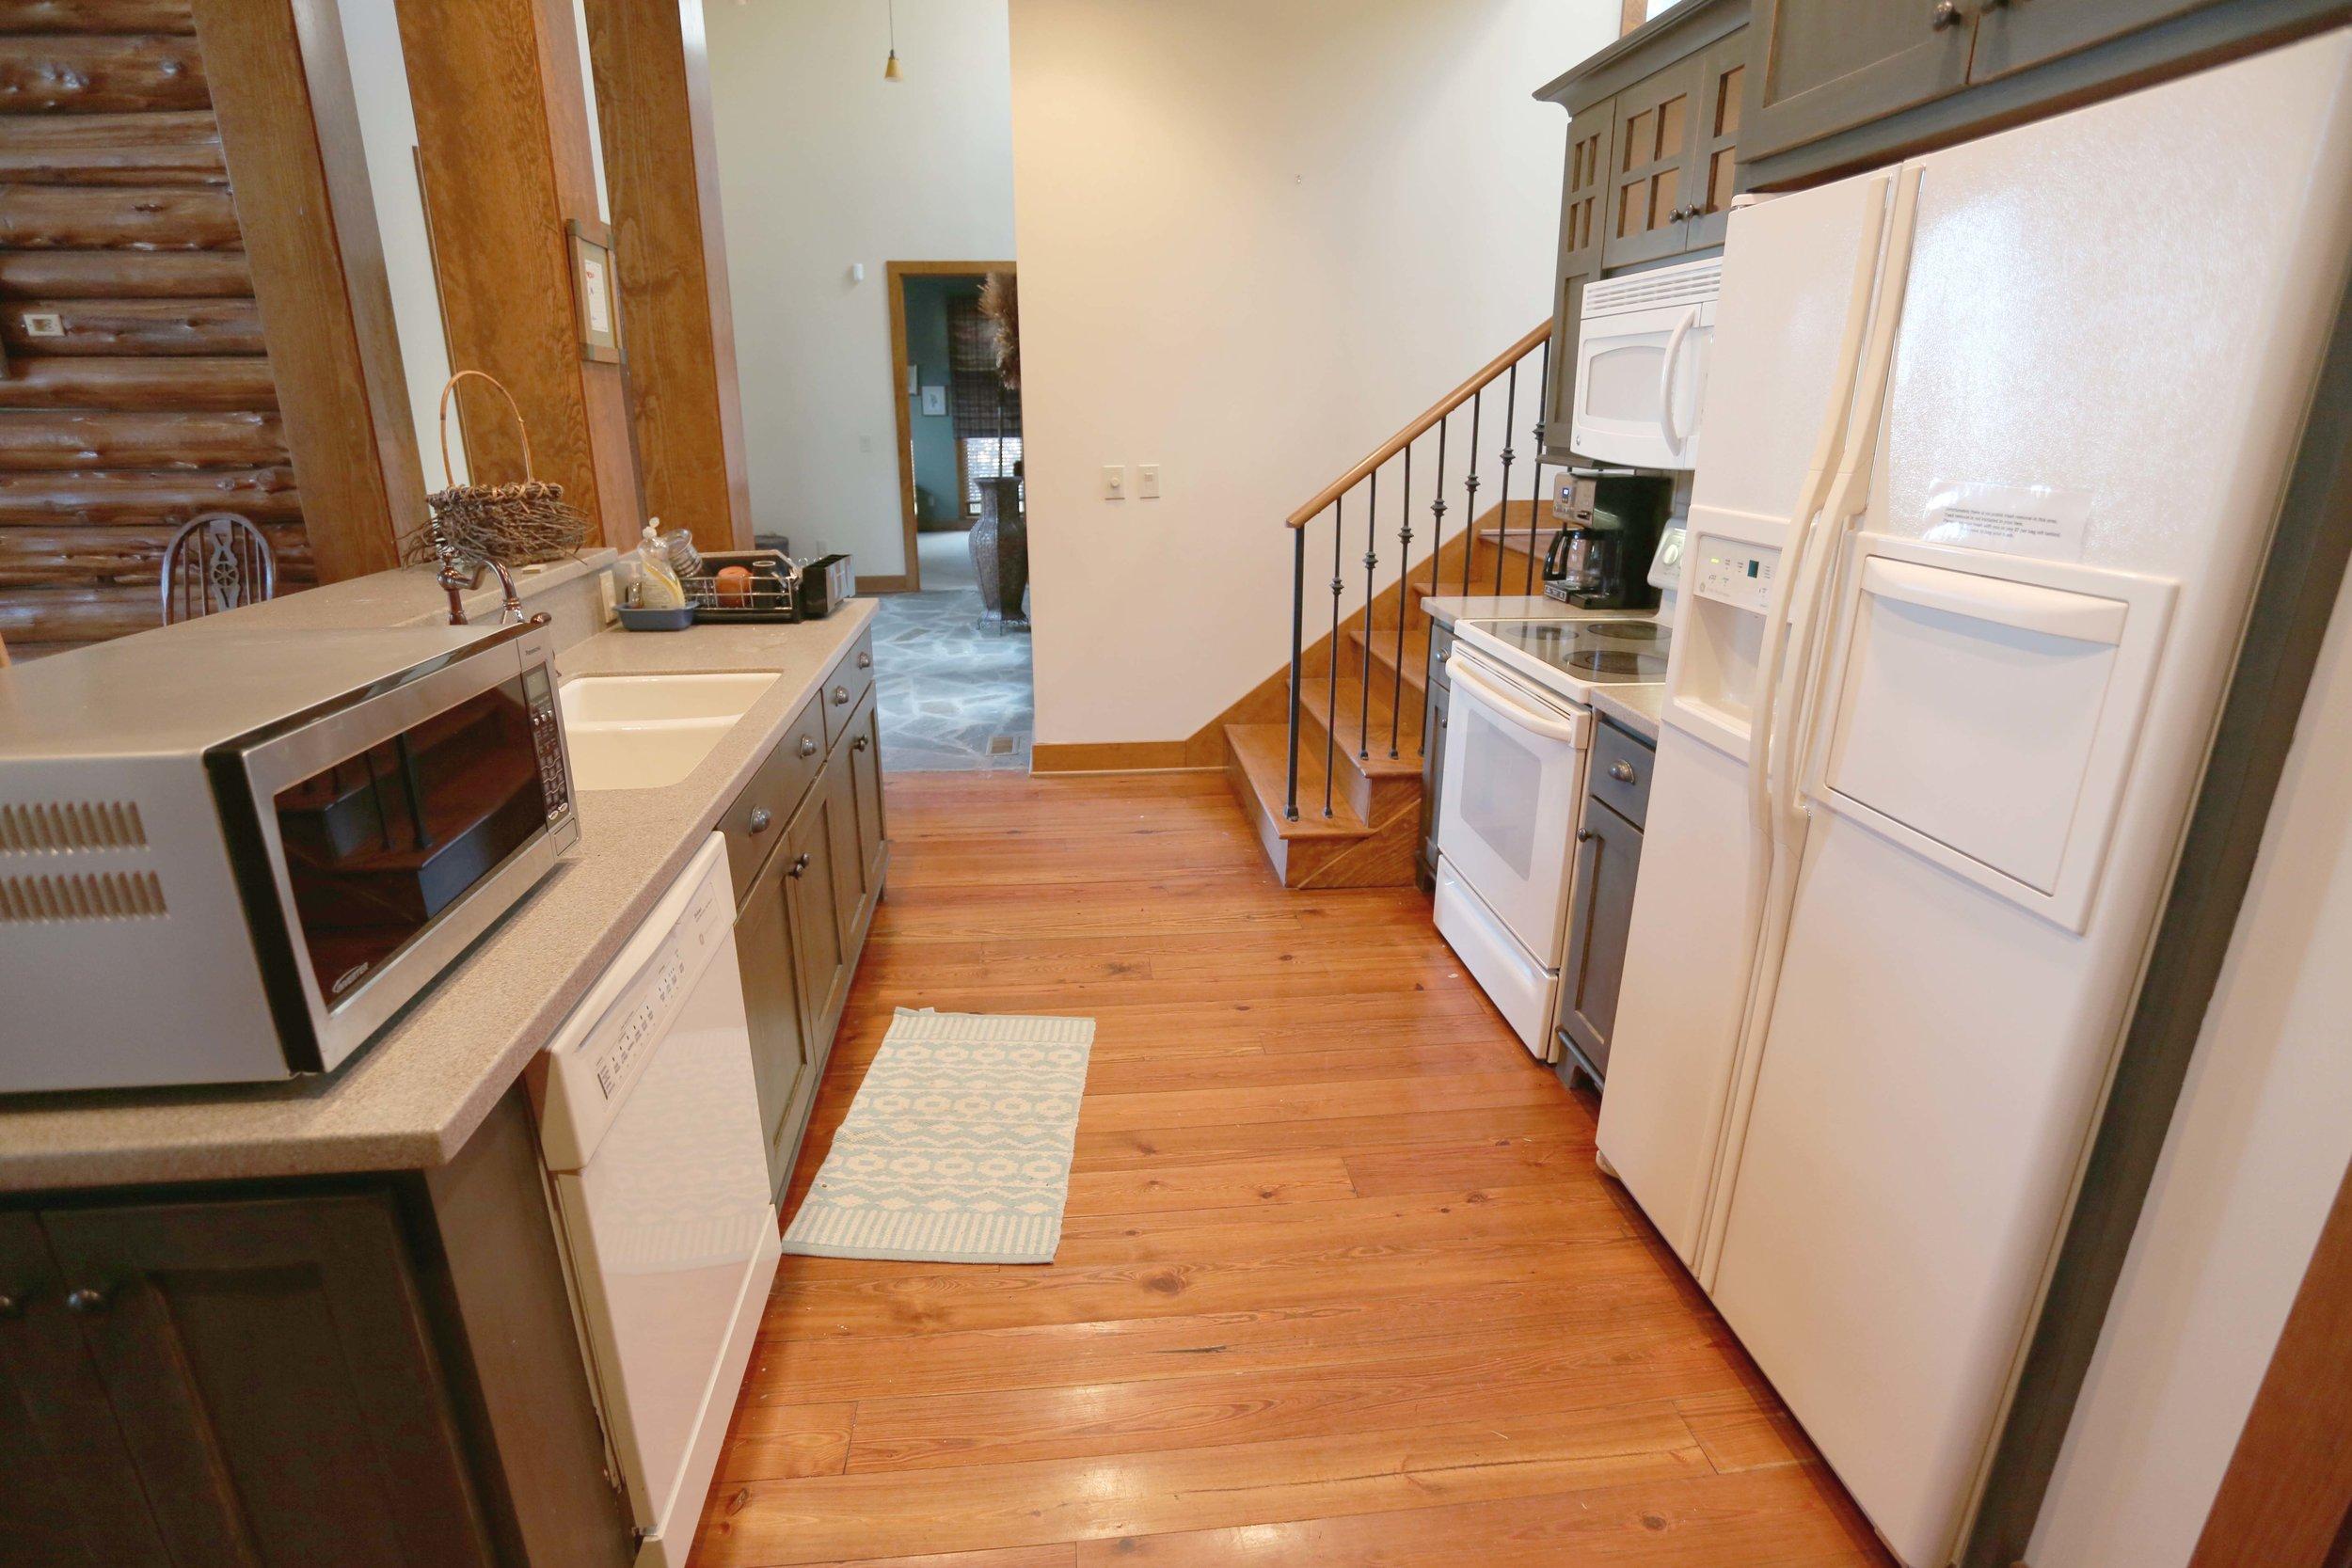 L kitchen side view.jpg